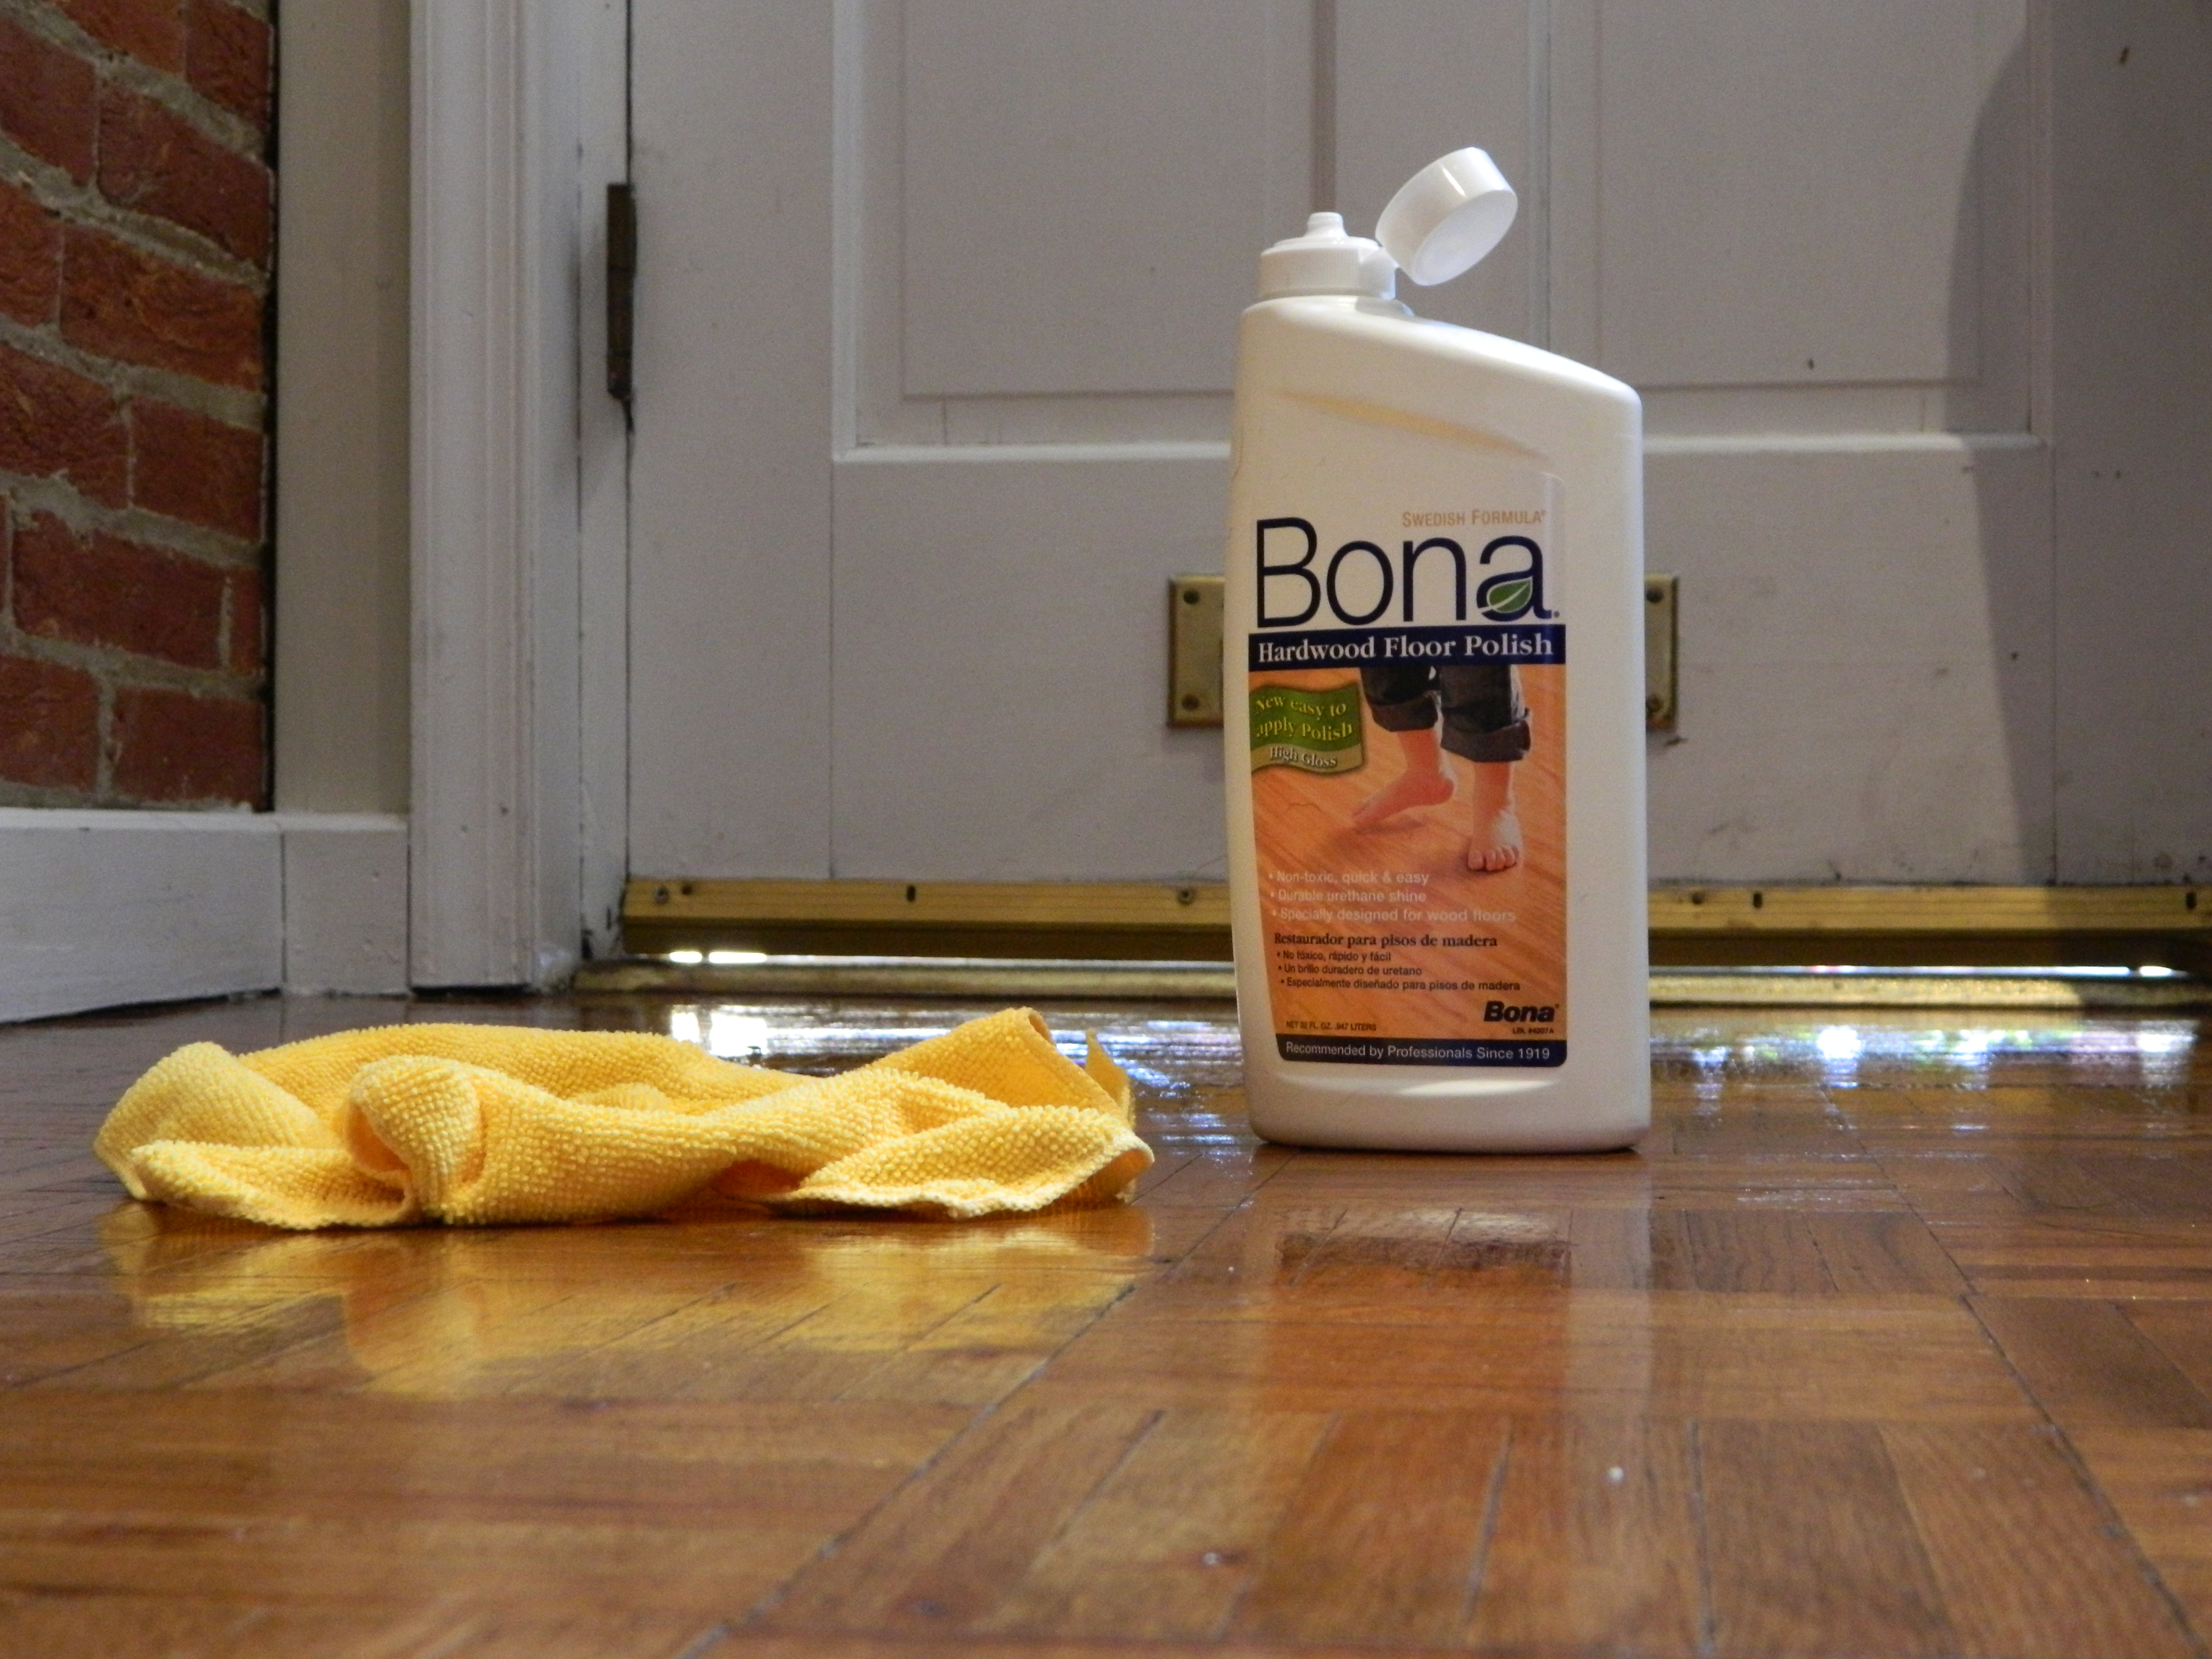 House Cleaning Bona Hardwood Floor Polish Clean Floors